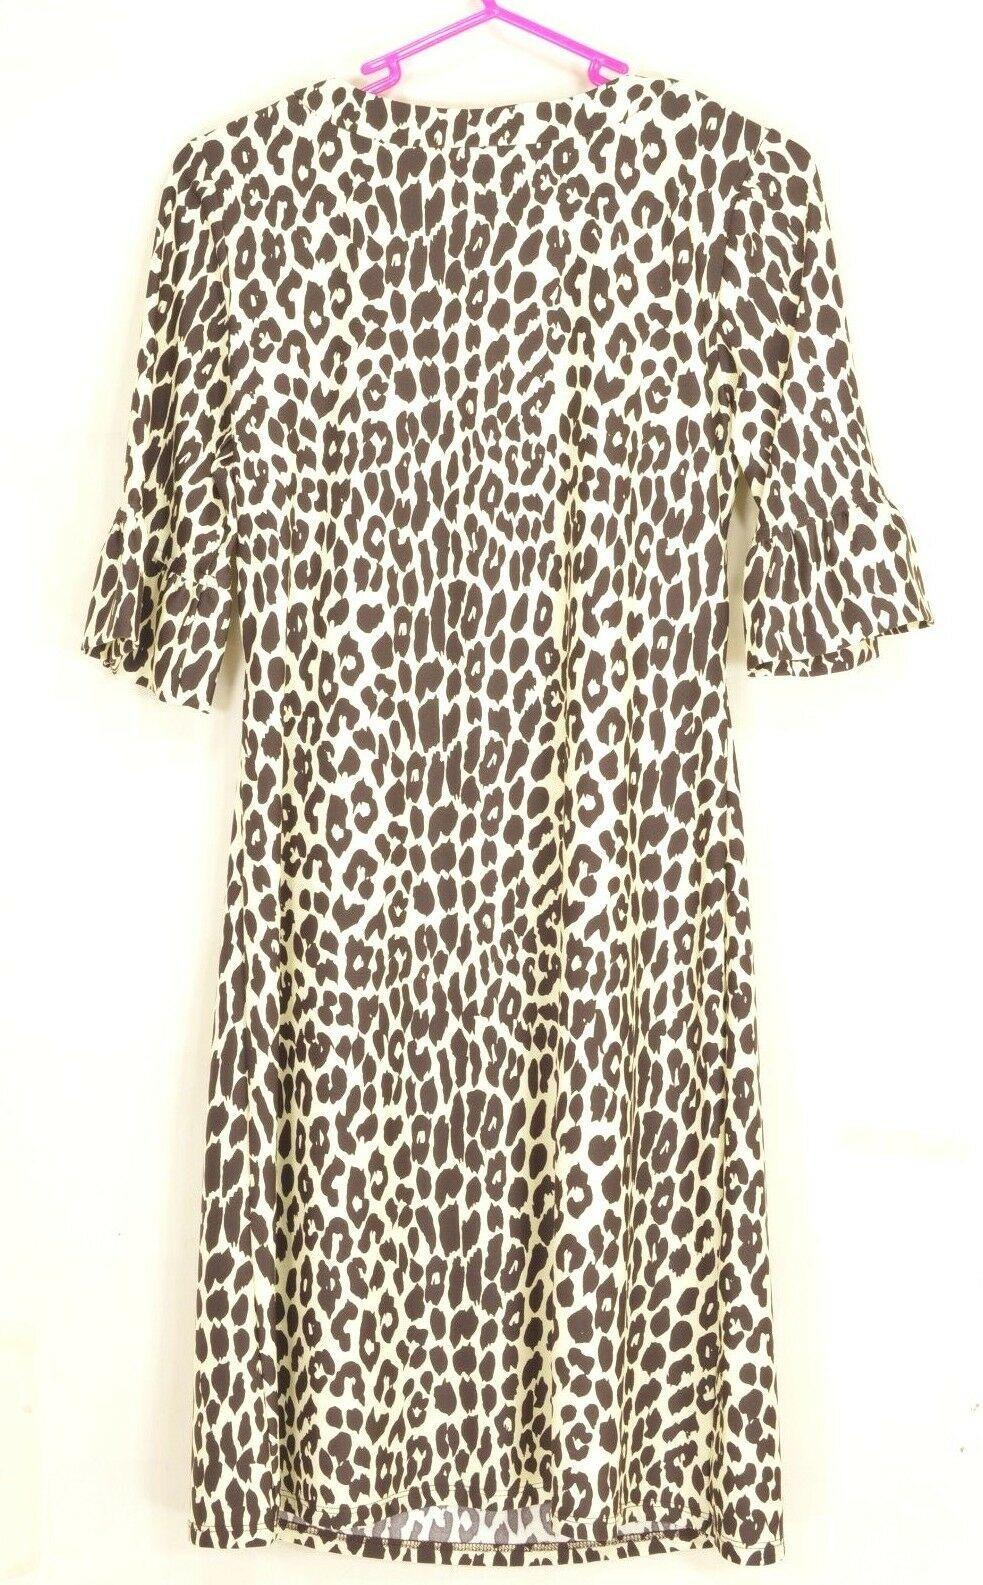 Jude Connally dress mini SZ S white with brown animal leopard print 3/4 slv USA